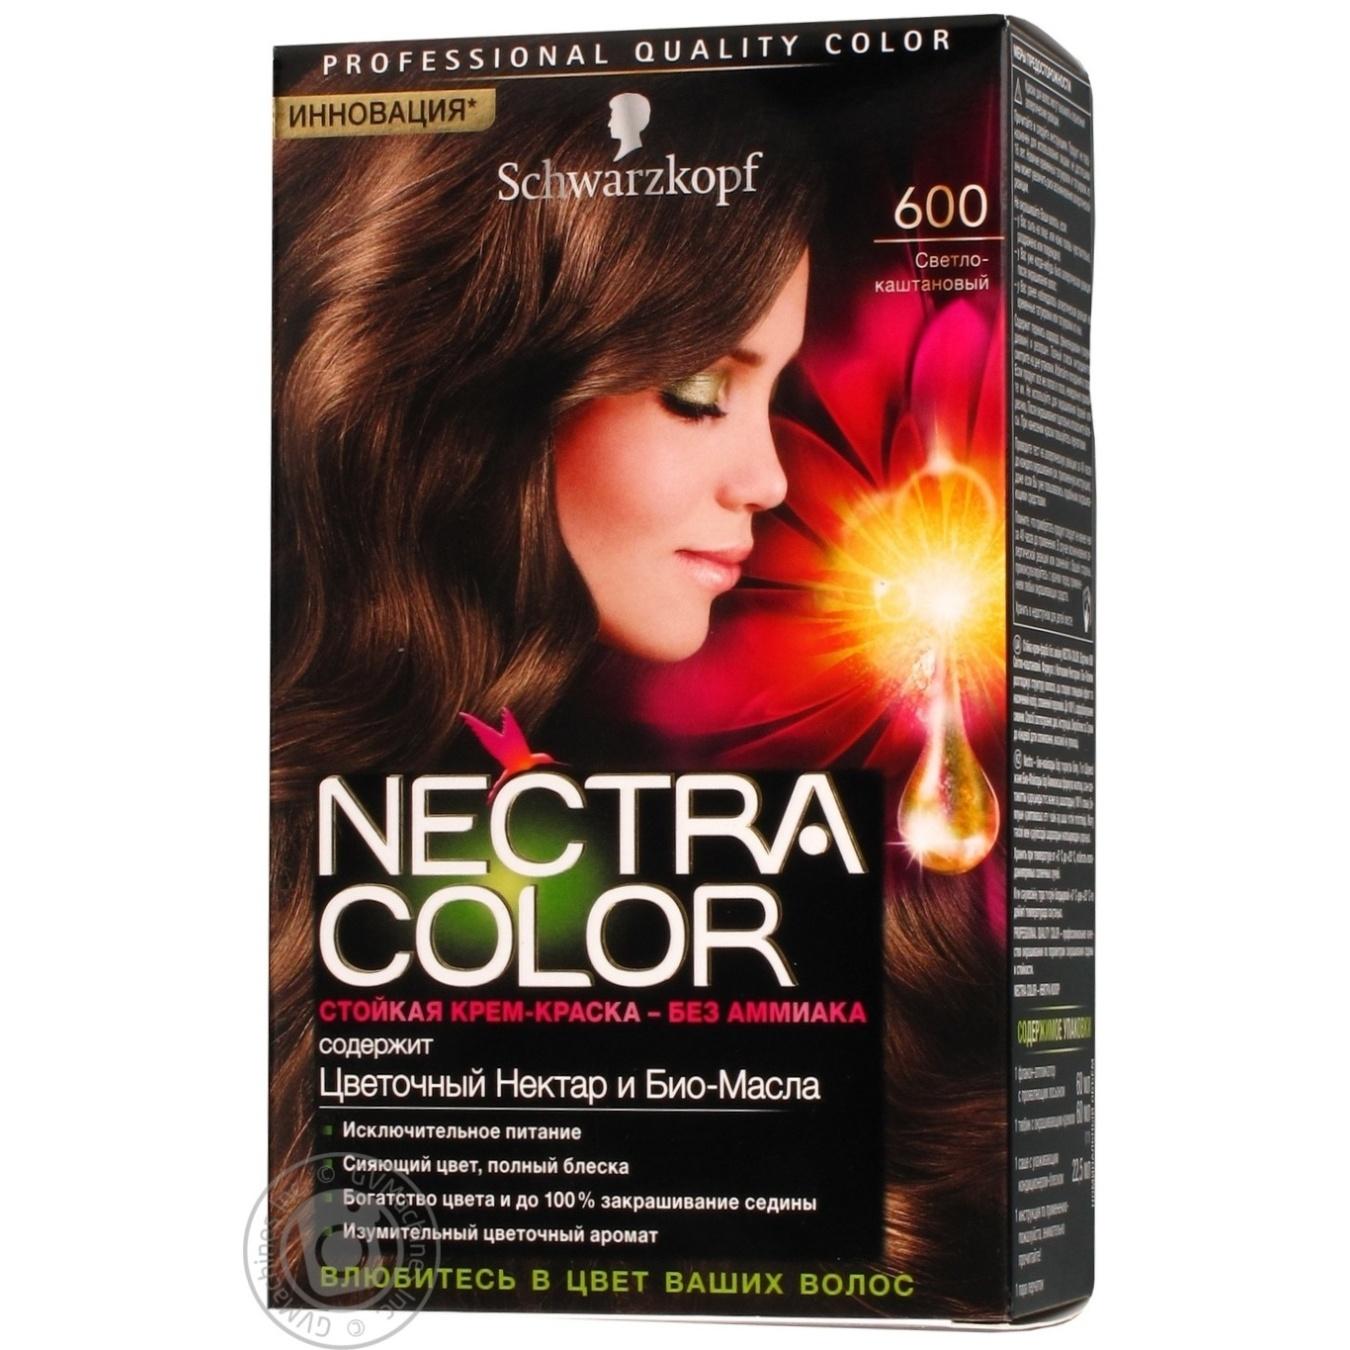 color schwarzkopf nectra light chestnut ammonia free for hair germany - Nectra Color Schwarzkopf